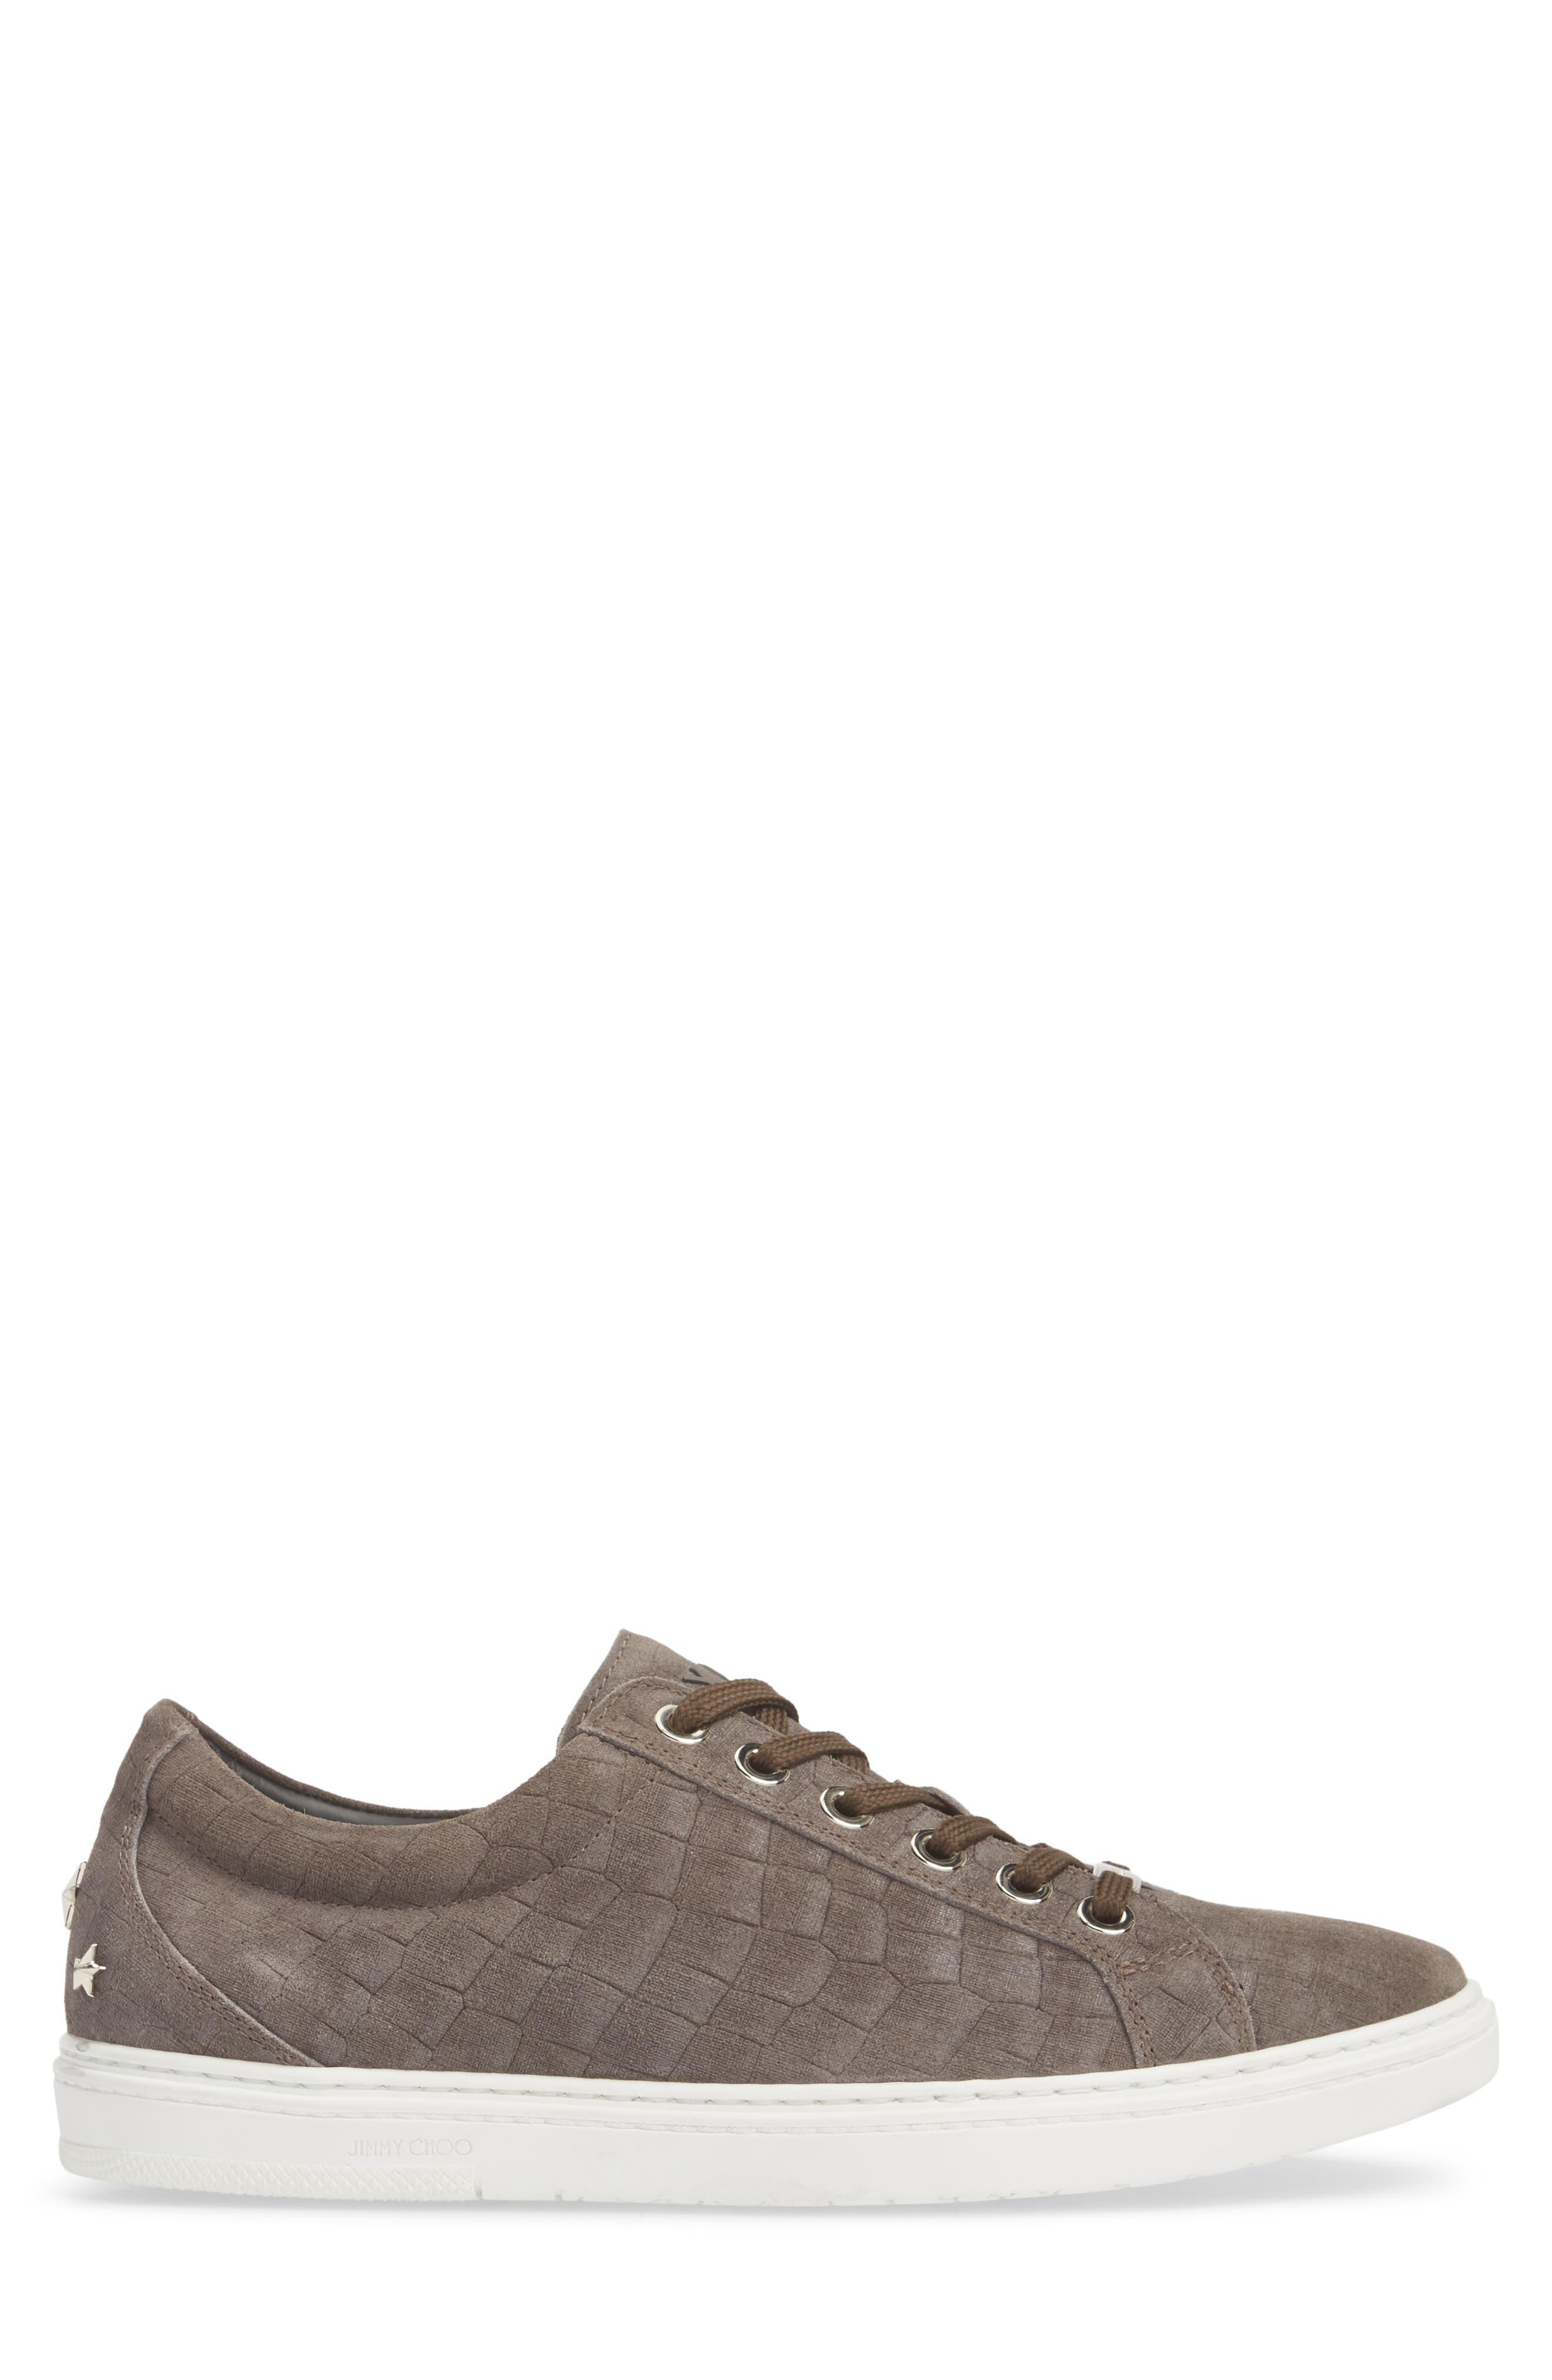 Cash Sneaker,                             Alternate thumbnail 3, color,                             021